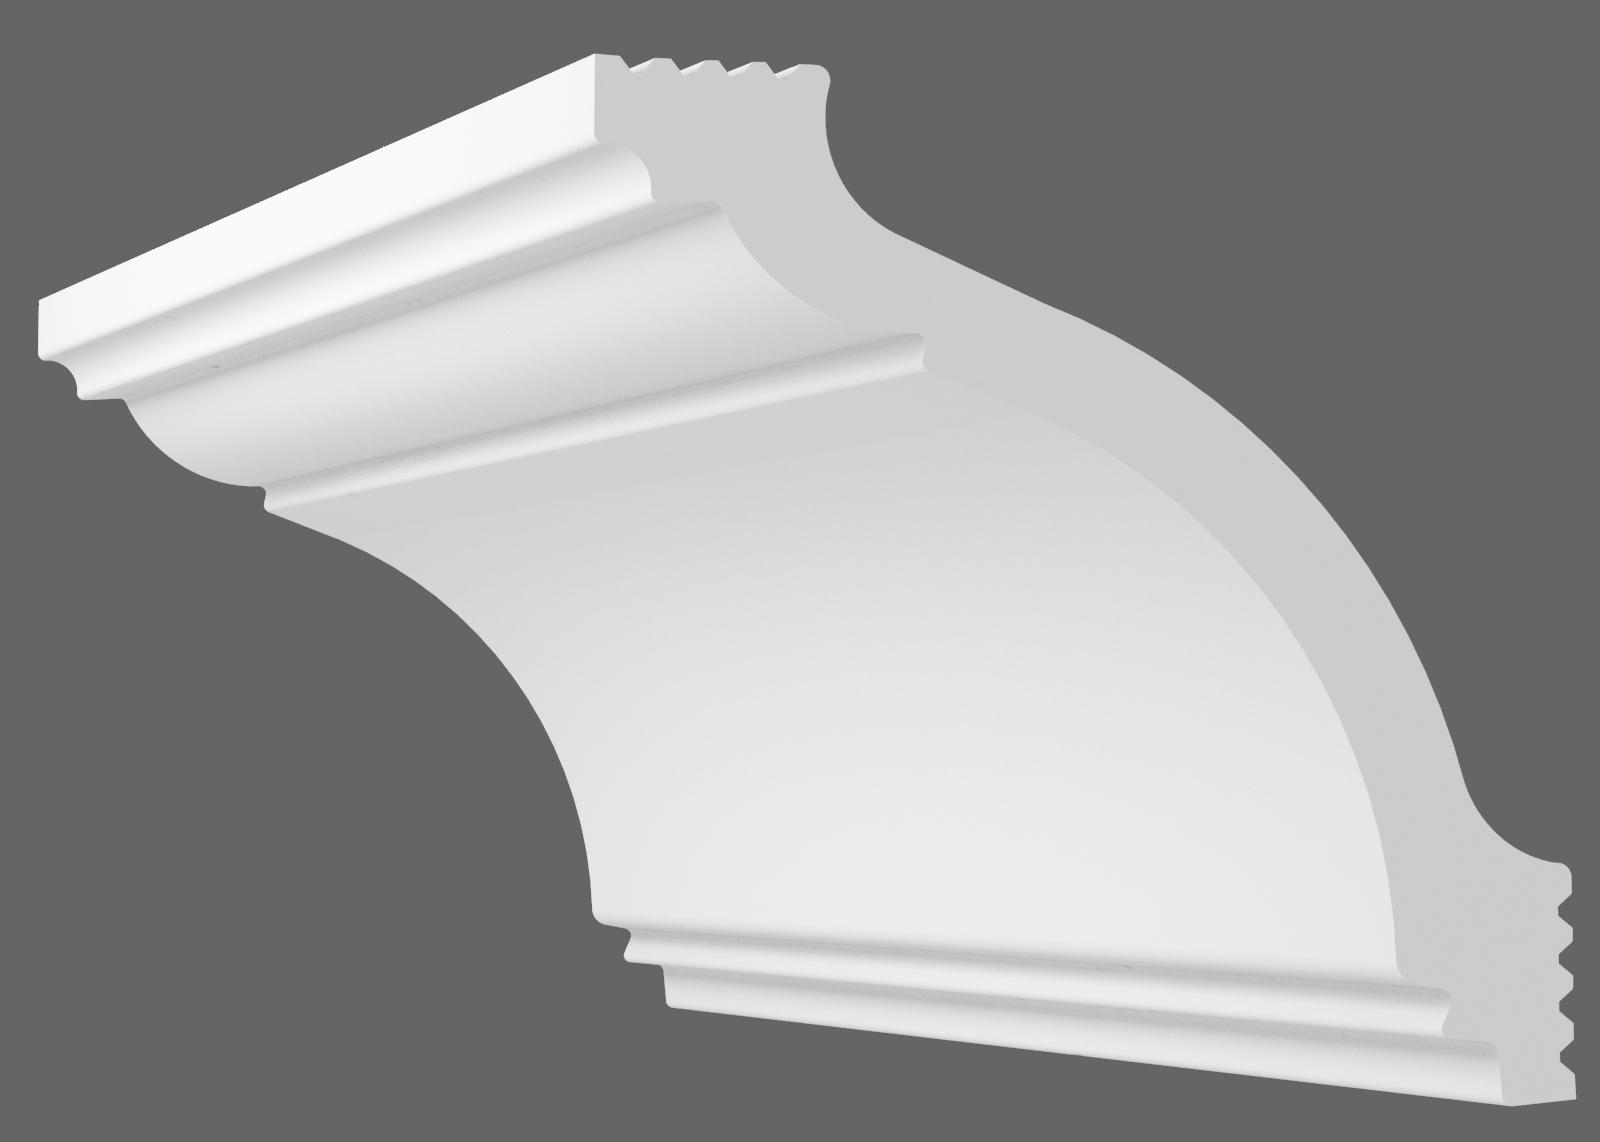 Потолочный плинтус А-110 (Размер: 80х75мм)